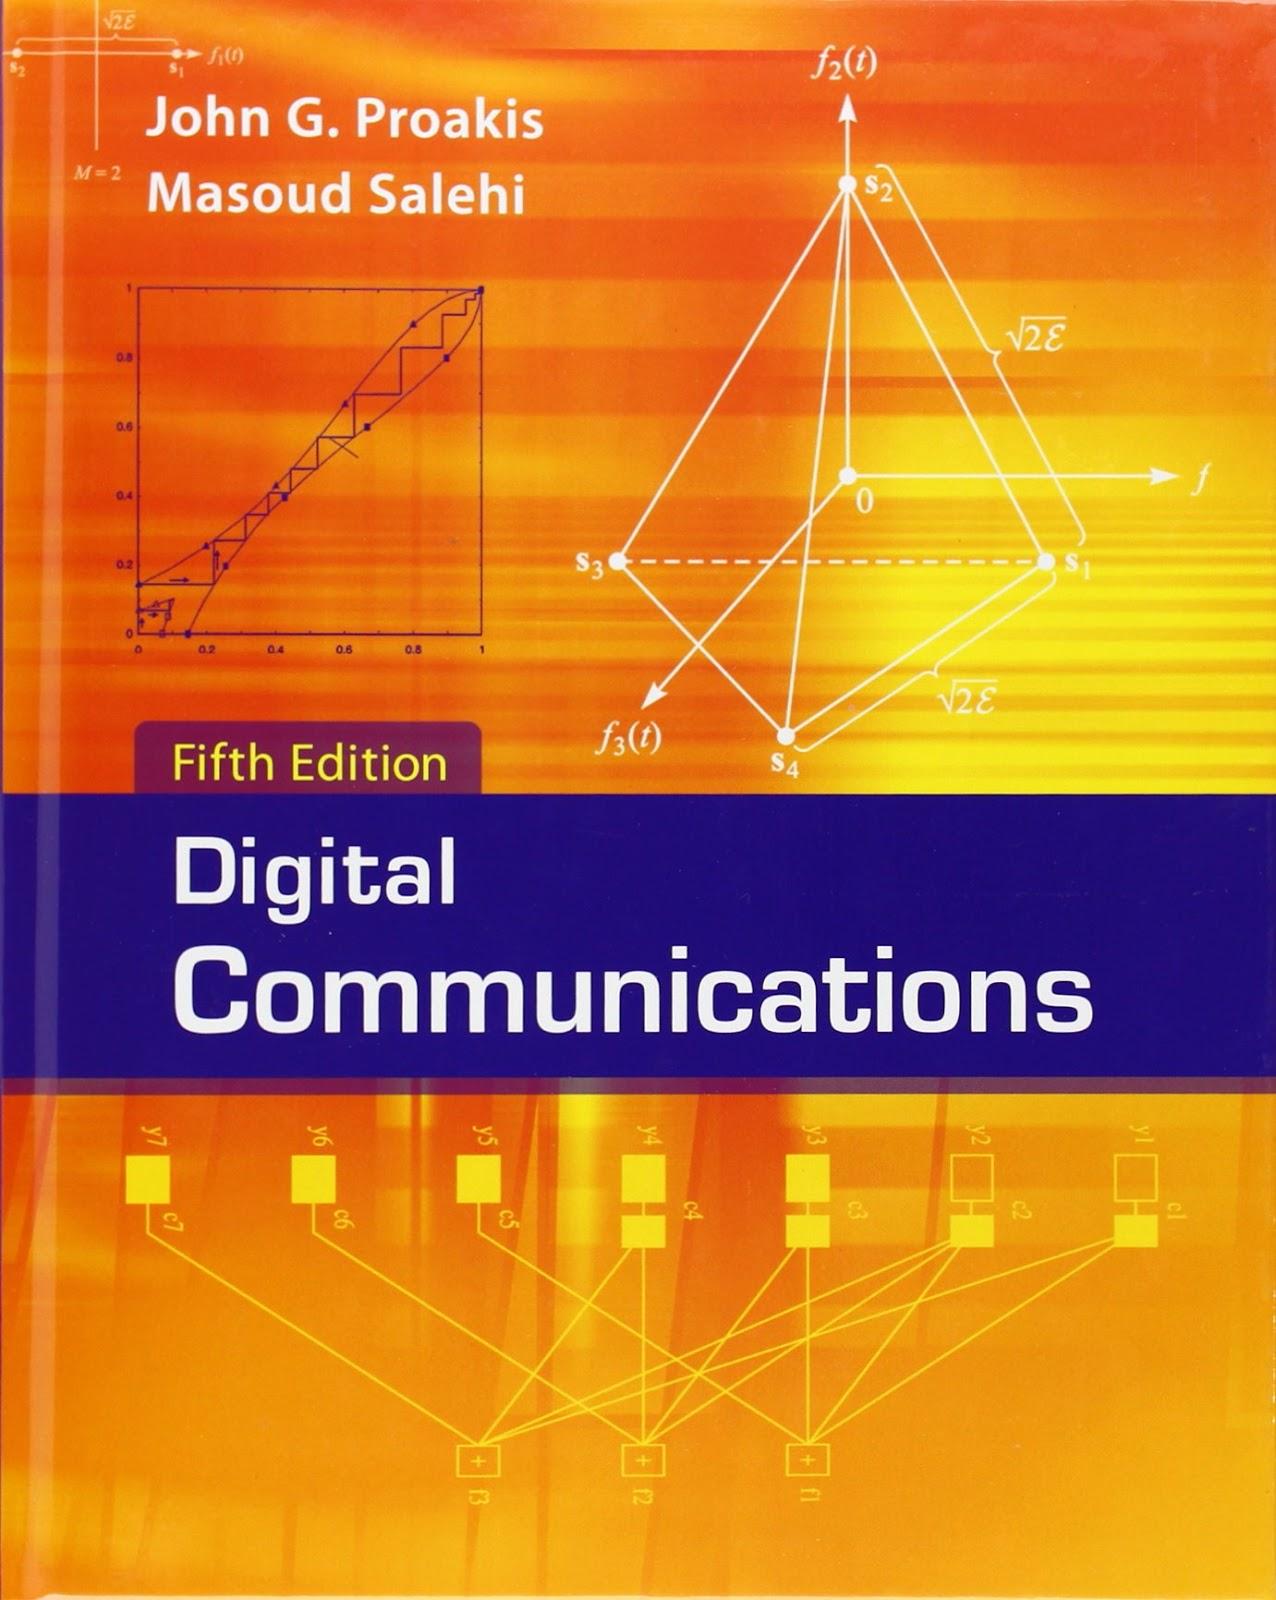 Ece Related Books Digital Communications By John Gproakis Masoud Analog Integrated Circuits Free Pdf Bookstore Salehi5th Edition